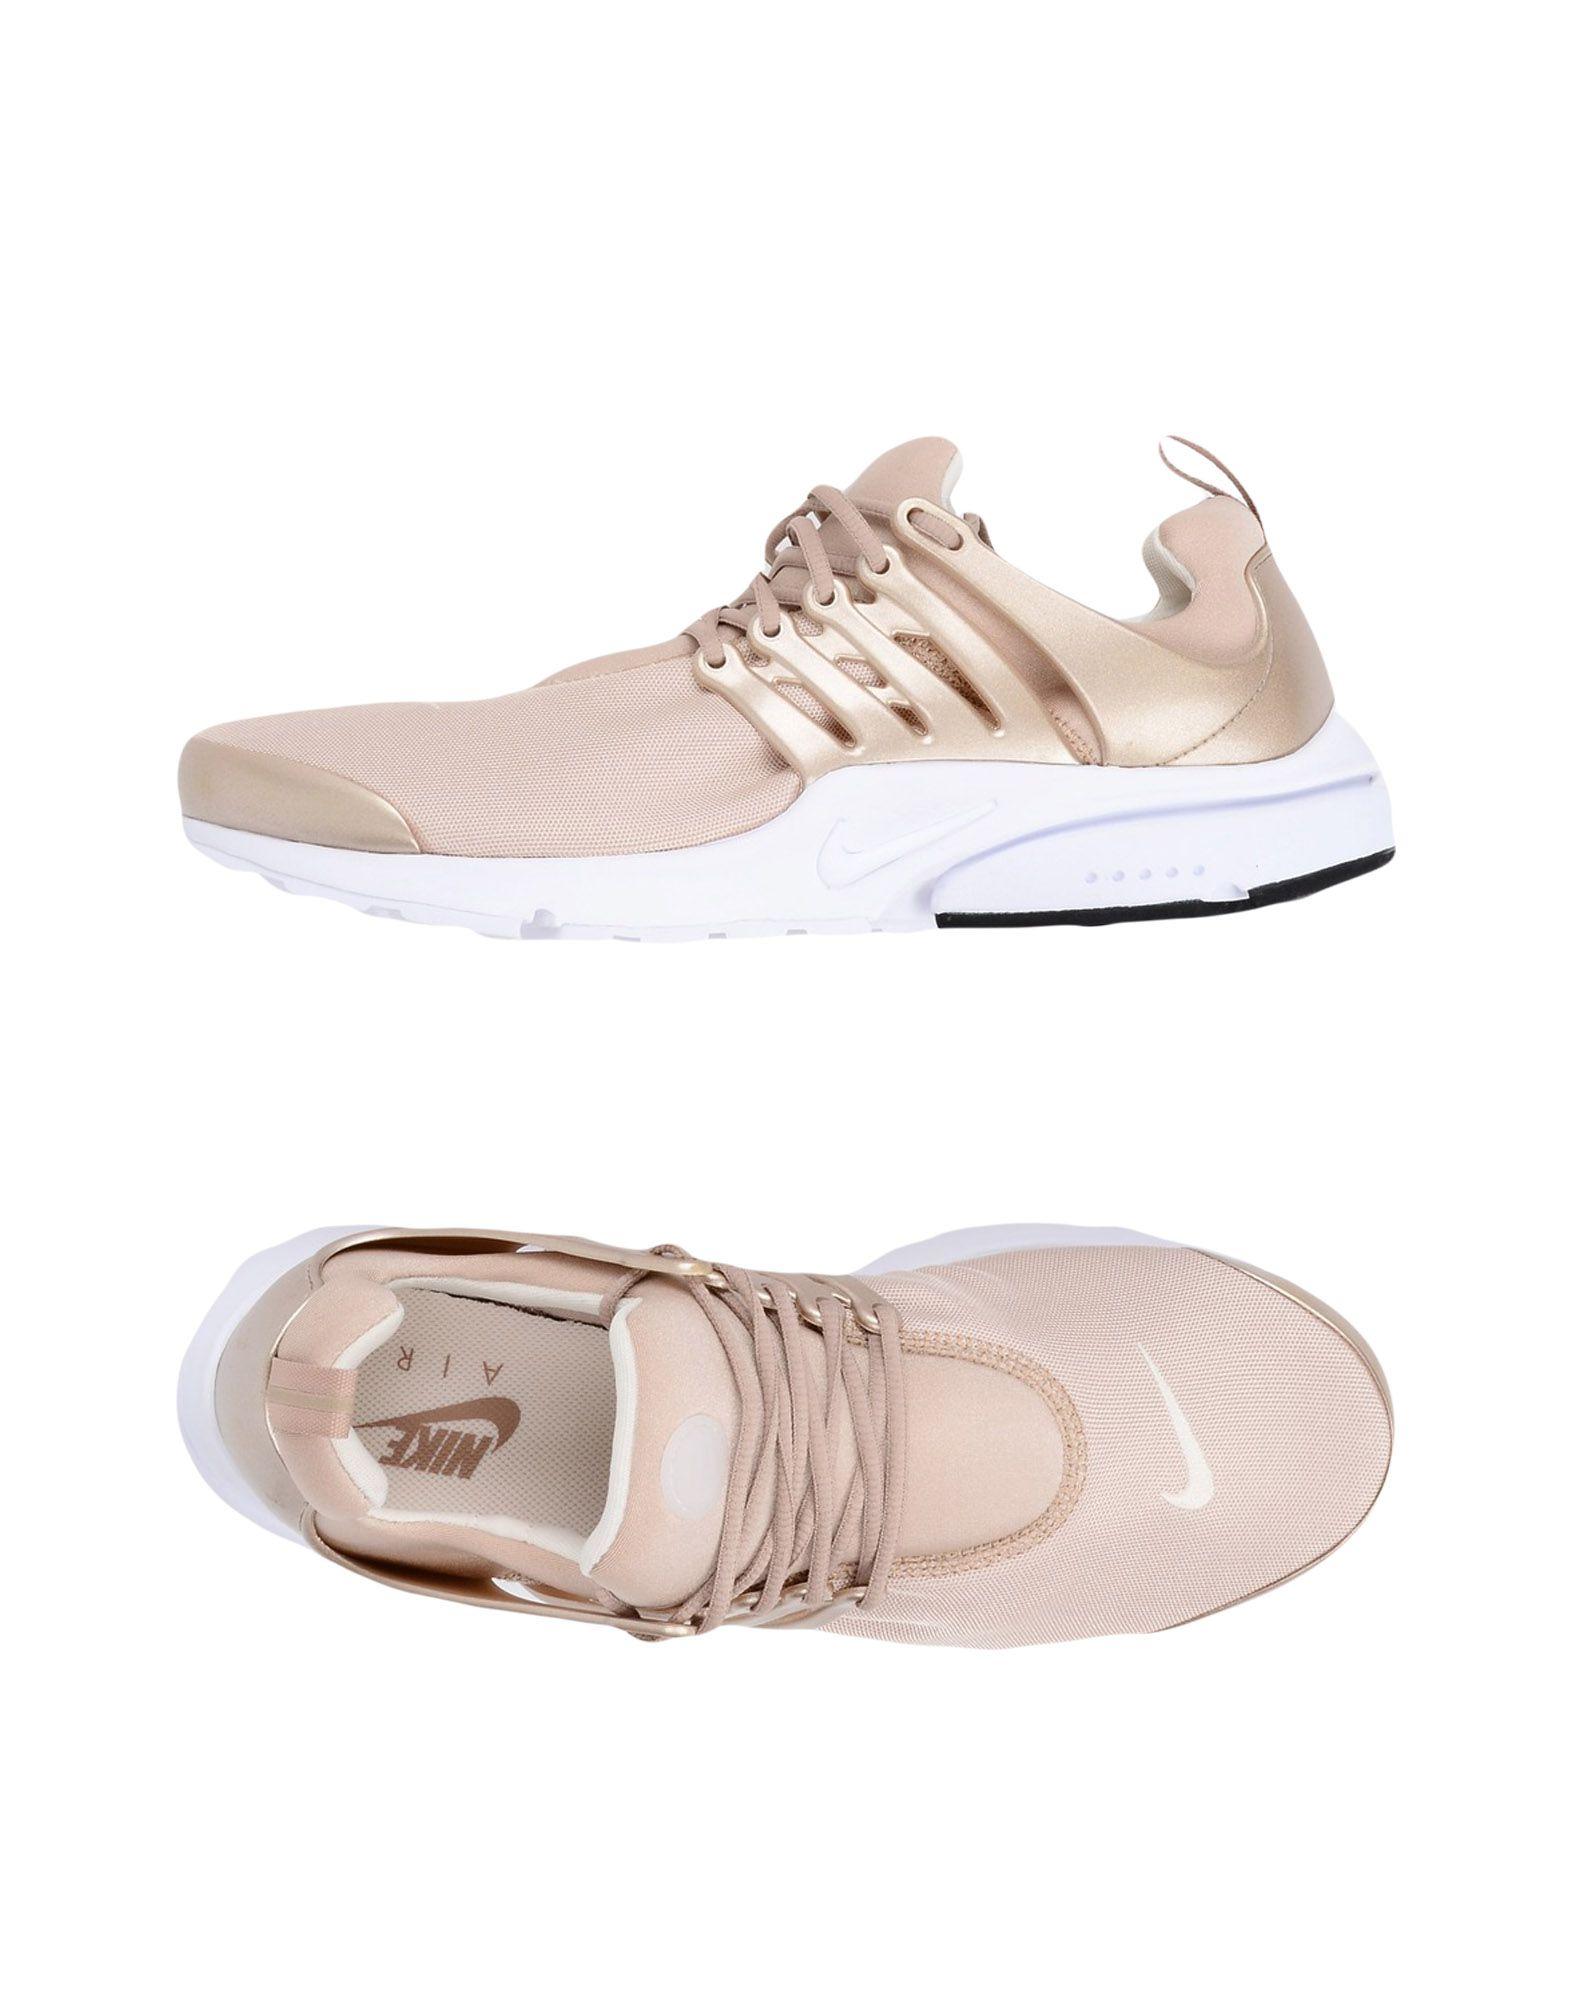 Rabatt echte Presto Schuhe Nike  Air Presto echte Premium  11325476JB b3f8d6